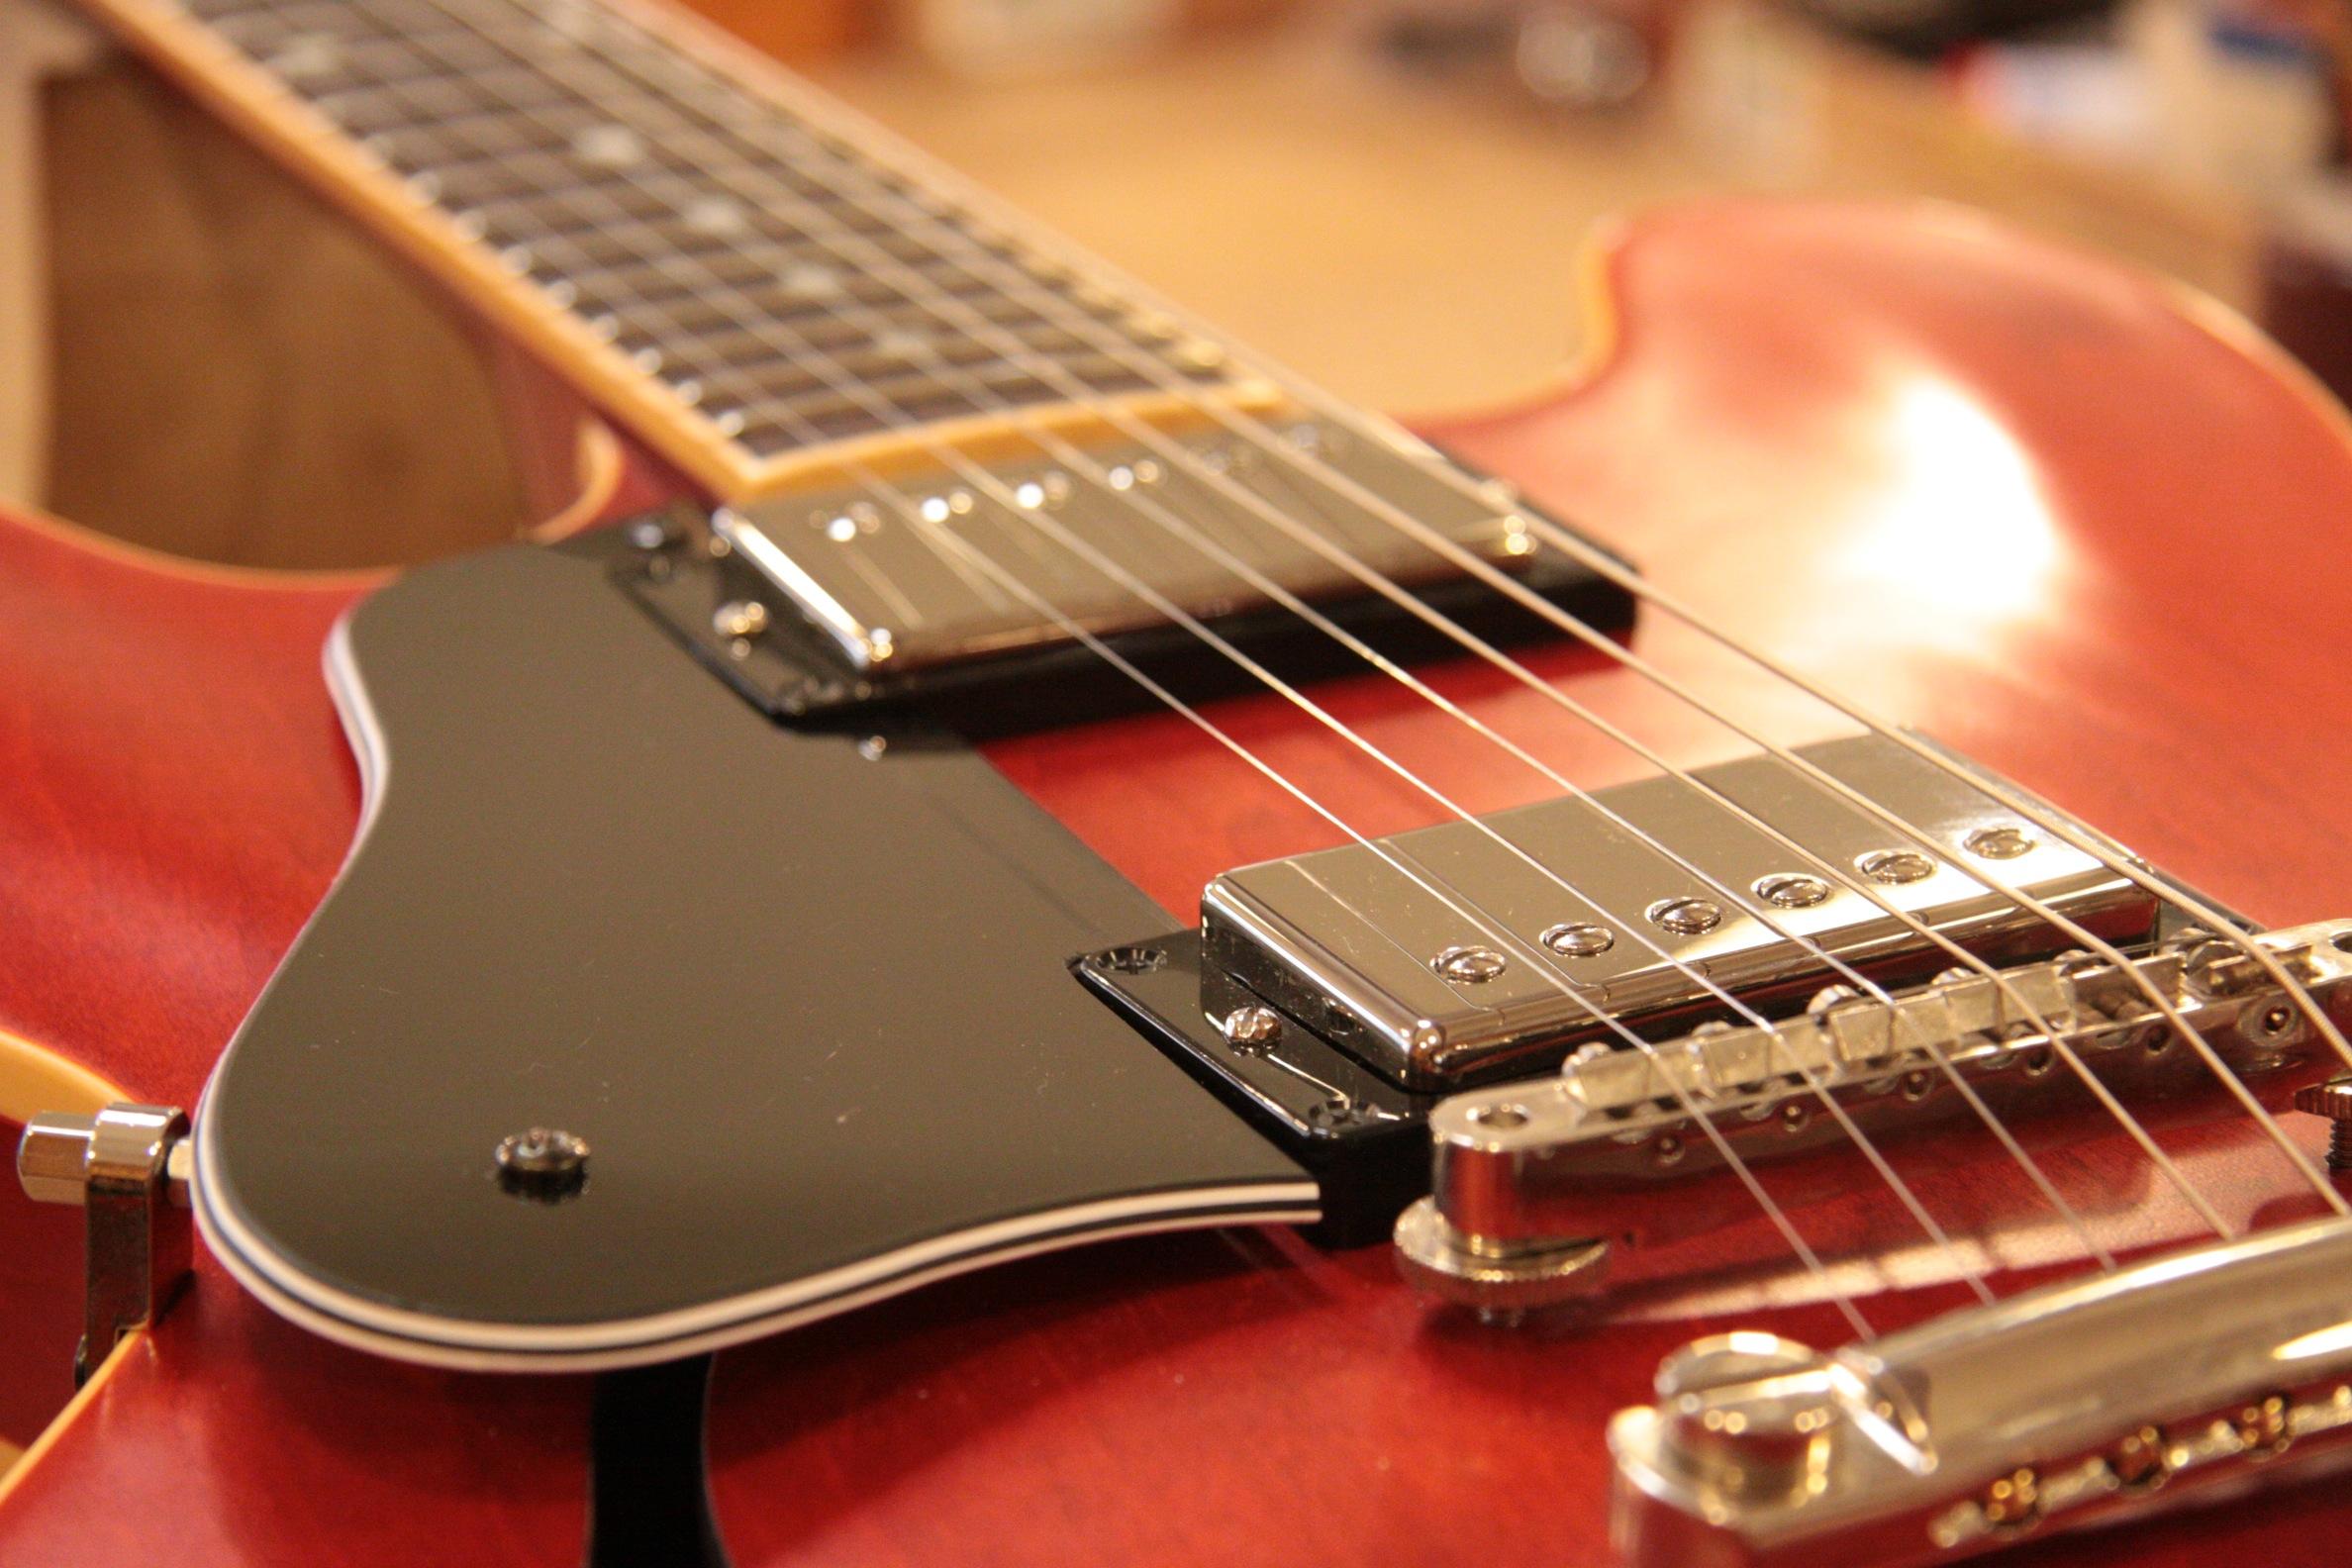 gibson es 333 customis e rockshop magasin de guitares montpellier magasin de musique. Black Bedroom Furniture Sets. Home Design Ideas